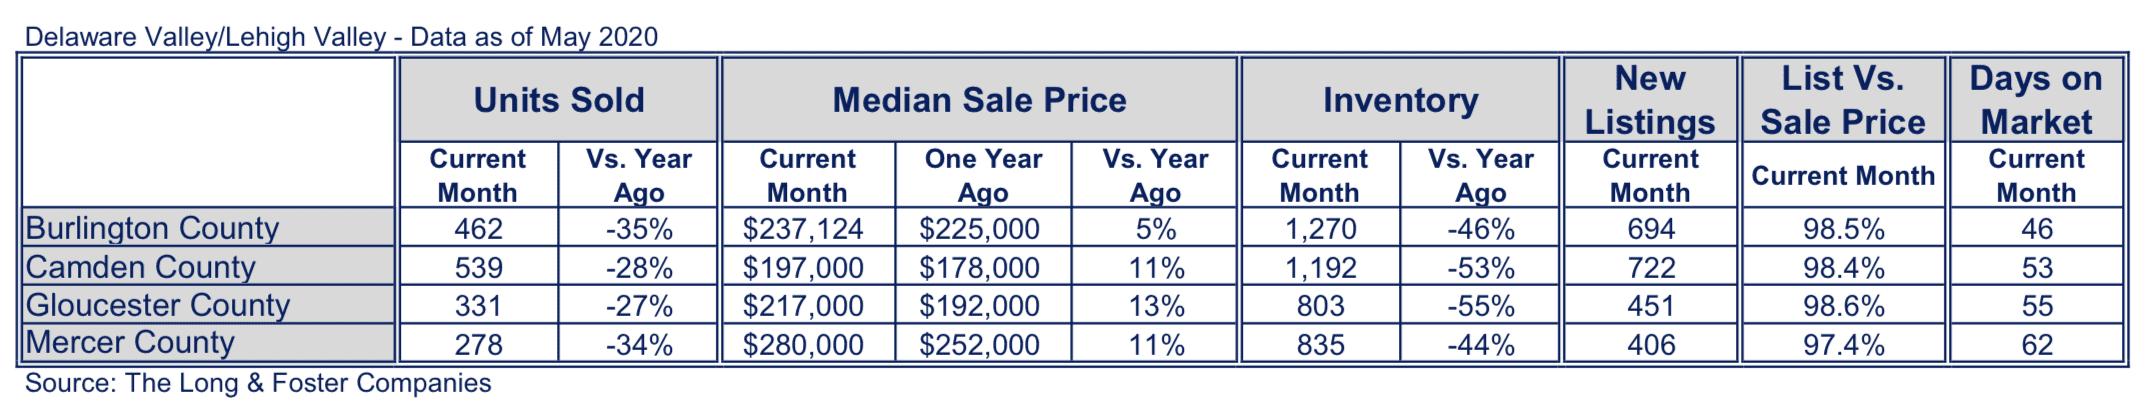 New Jersey Suburbs Market Minute Chart May 2020